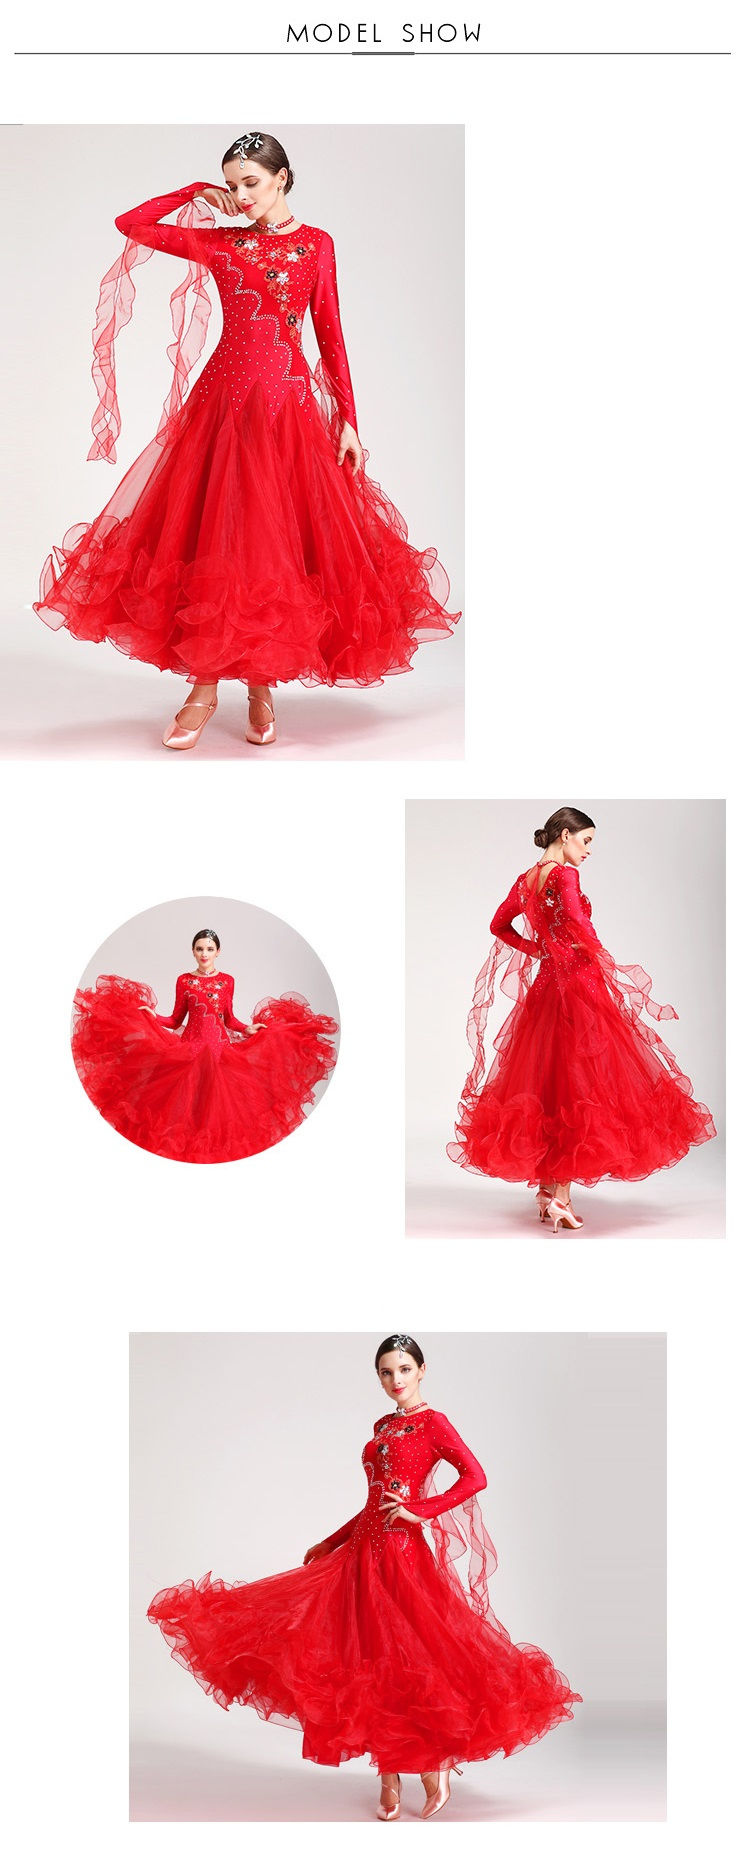 New Ballroom Competition Dance Costume Women Tango Flamenco Waltz Steps Diagram 1 2 3 4 5